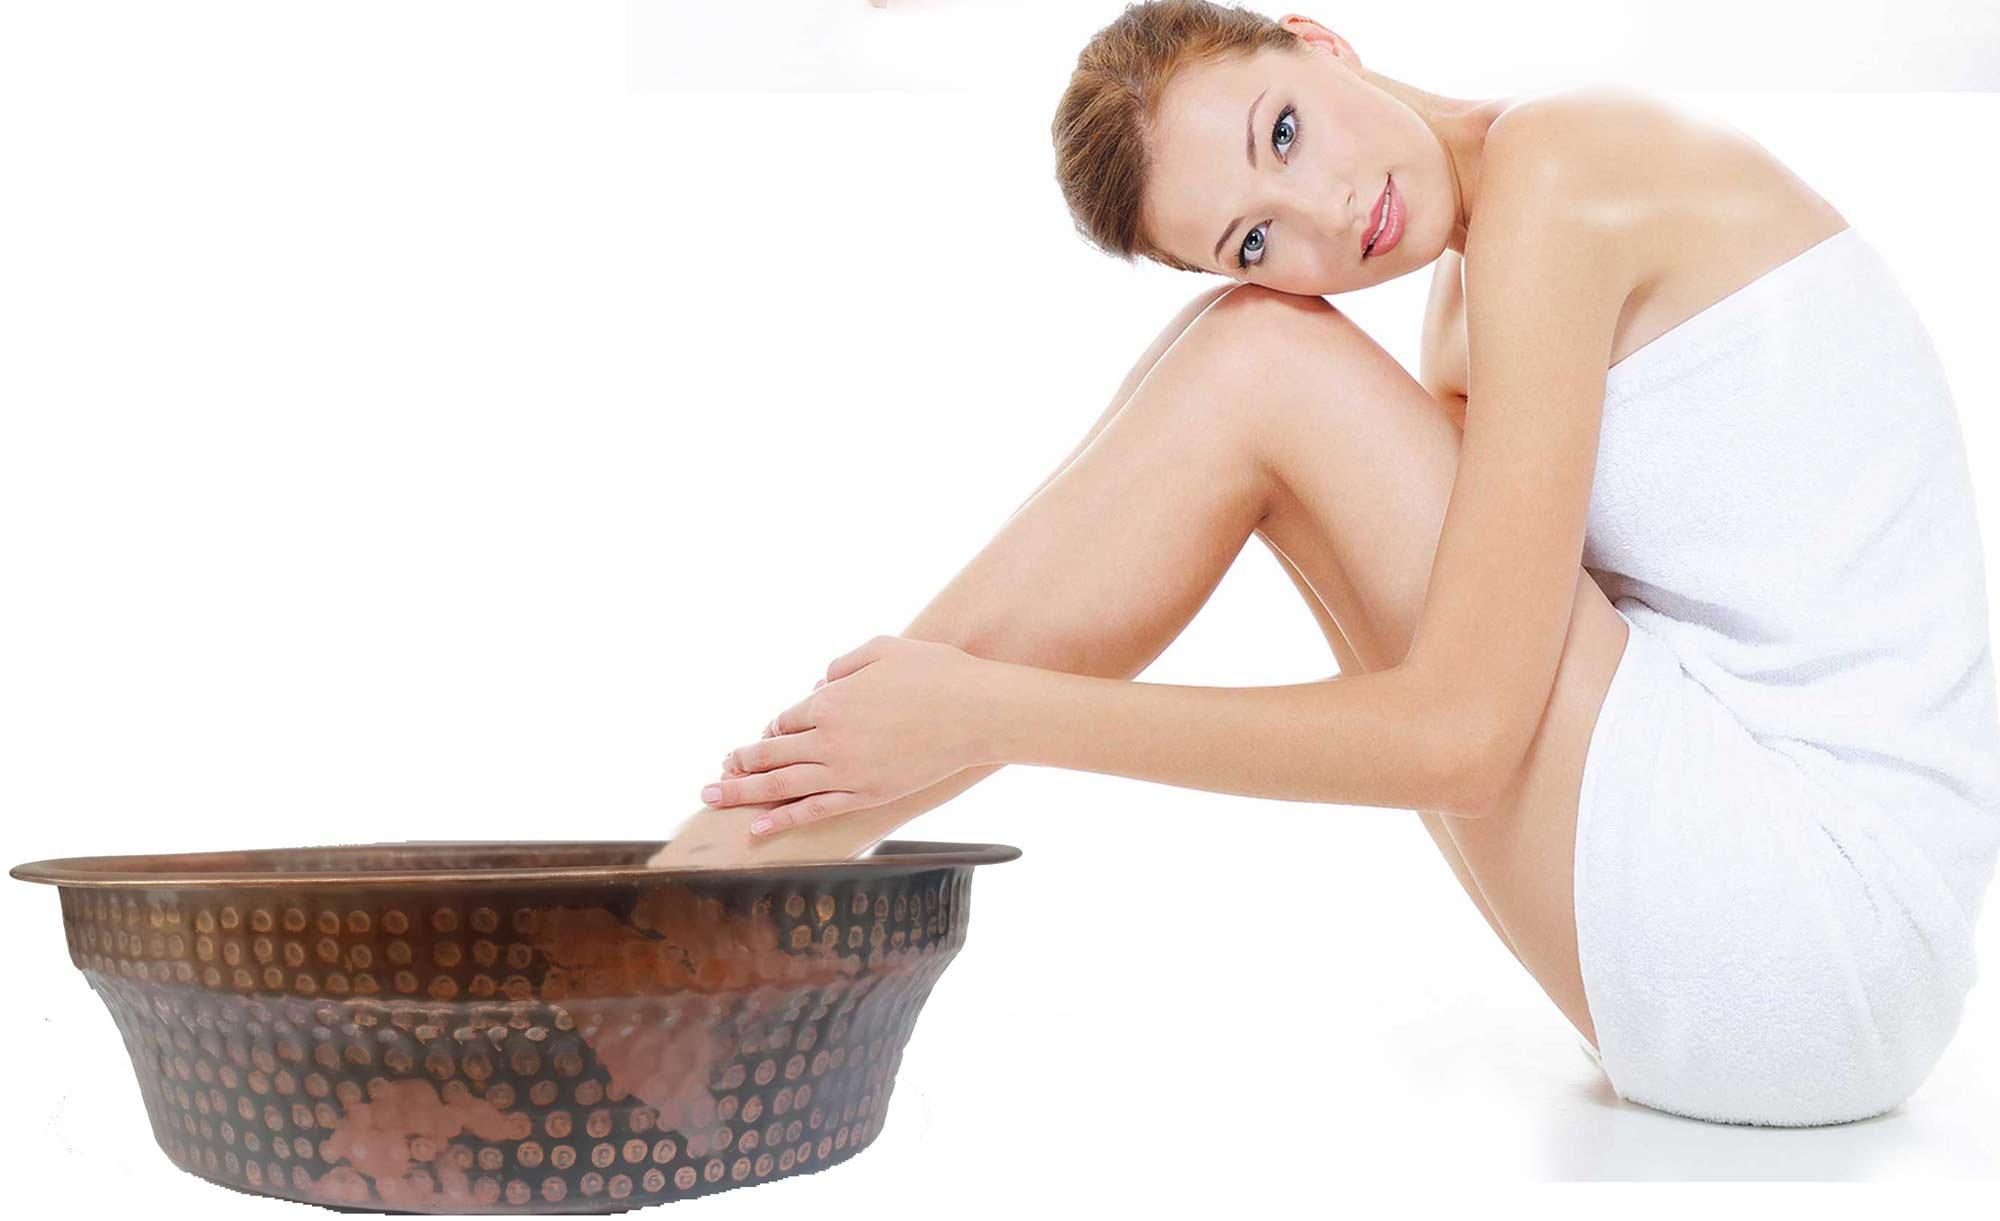 Egypt gift shops HANDMADE Rubbing Foot Bath Massage Therapy therapeutic Toenails Remedy Legs fatigue healing Pedicure Soaking Spa Bowl